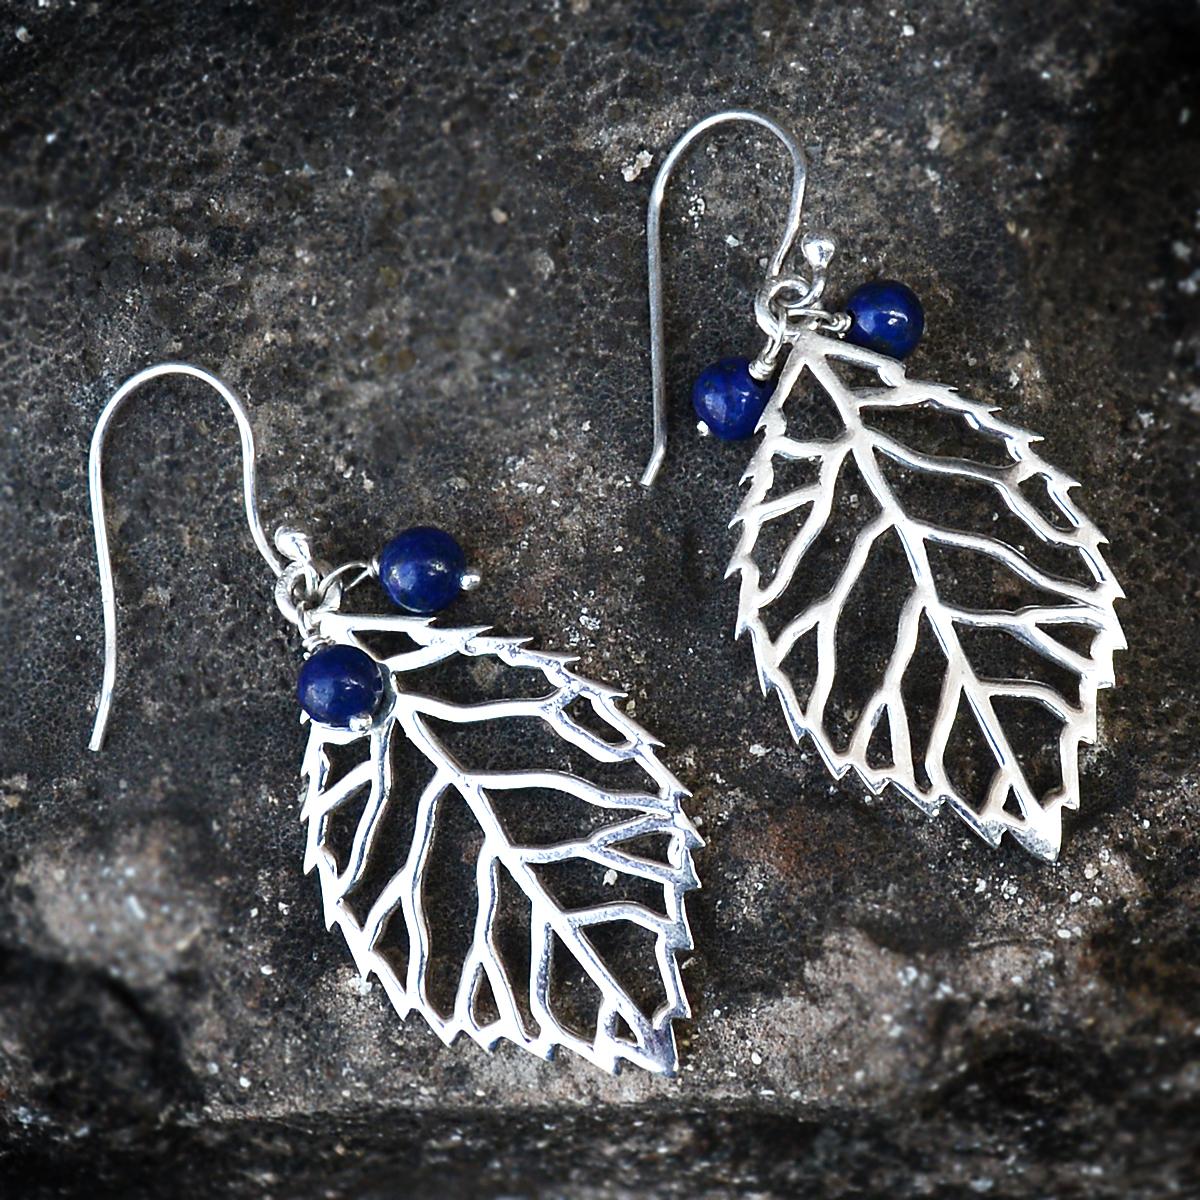 Handmade Jewelry Manufacturer Lapis Lazuli Gemstone 925 Sterling Silver Jaipur Rajasthan India Dangle Earring